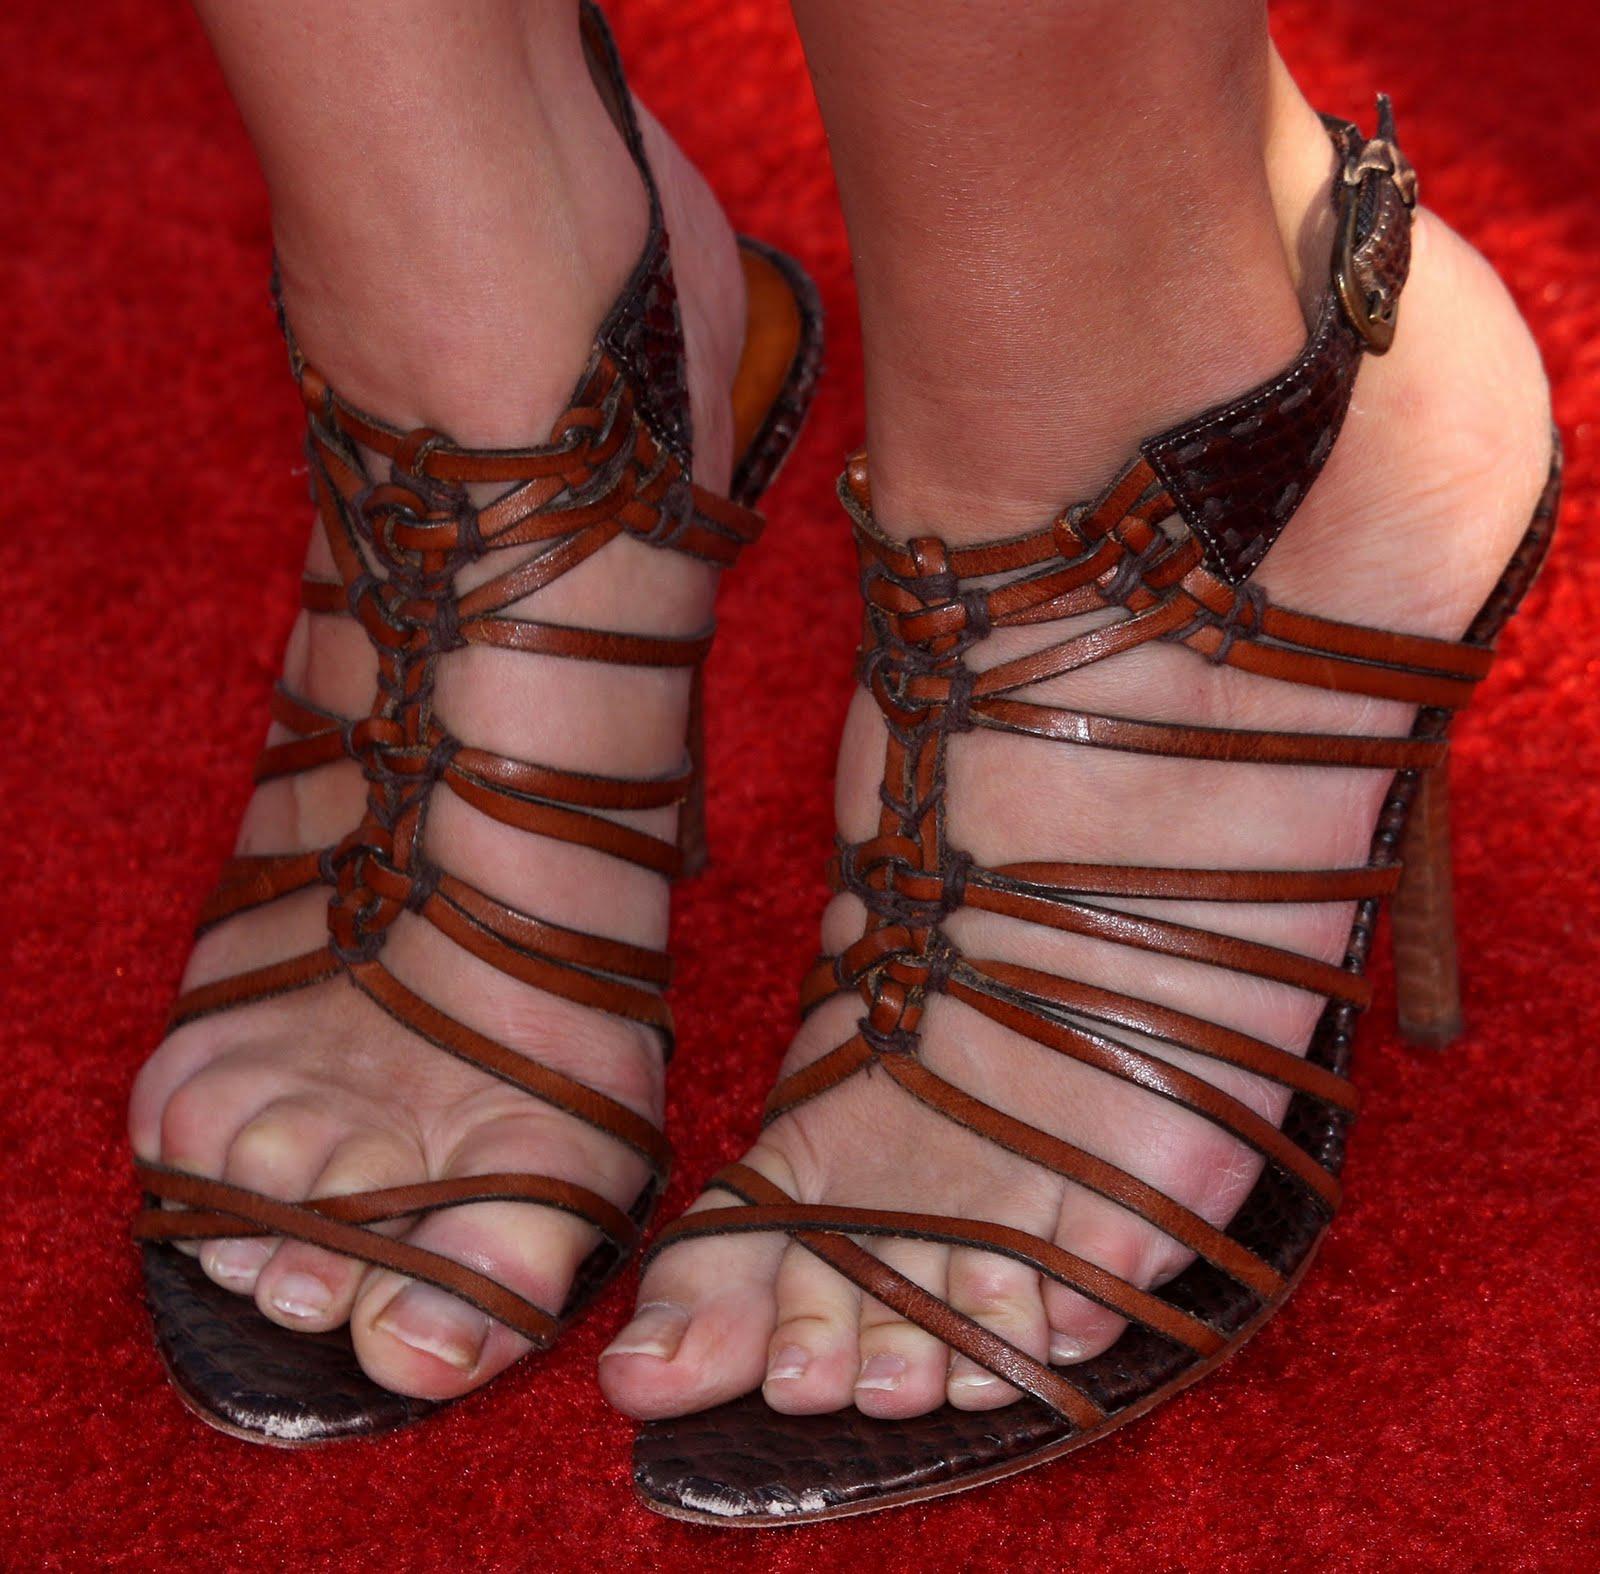 Jennifer Finnigan Feet body foot: jennifer morrison feet